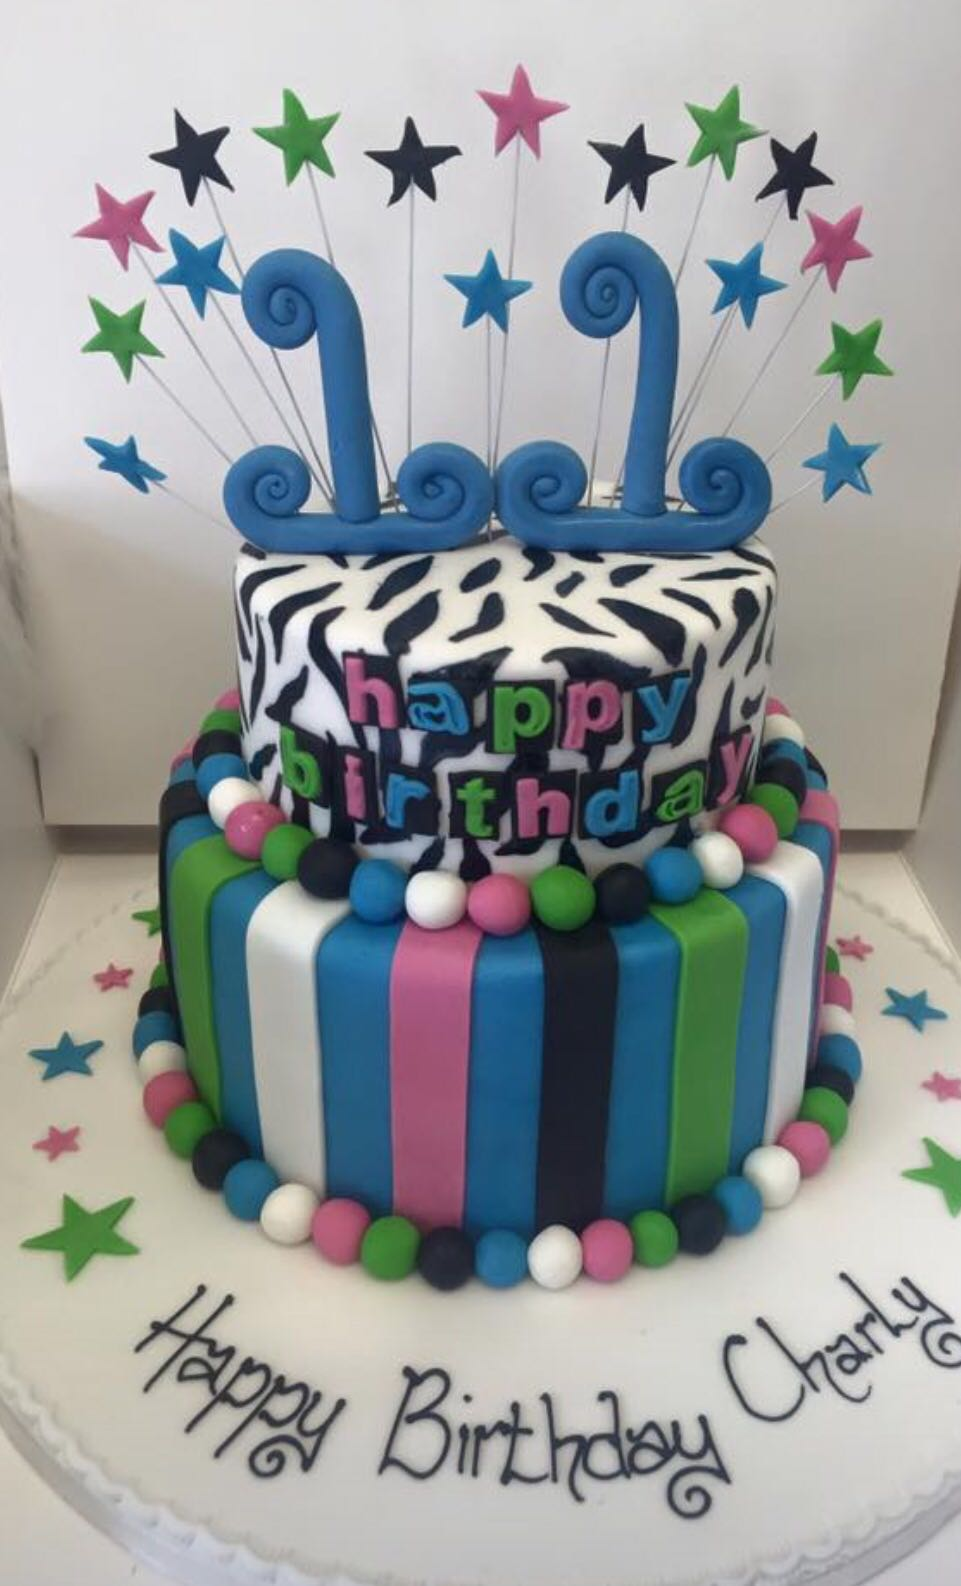 Astonishing Funky Birthday Cake Peter Herd Personalised Birthday Cards Arneslily Jamesorg